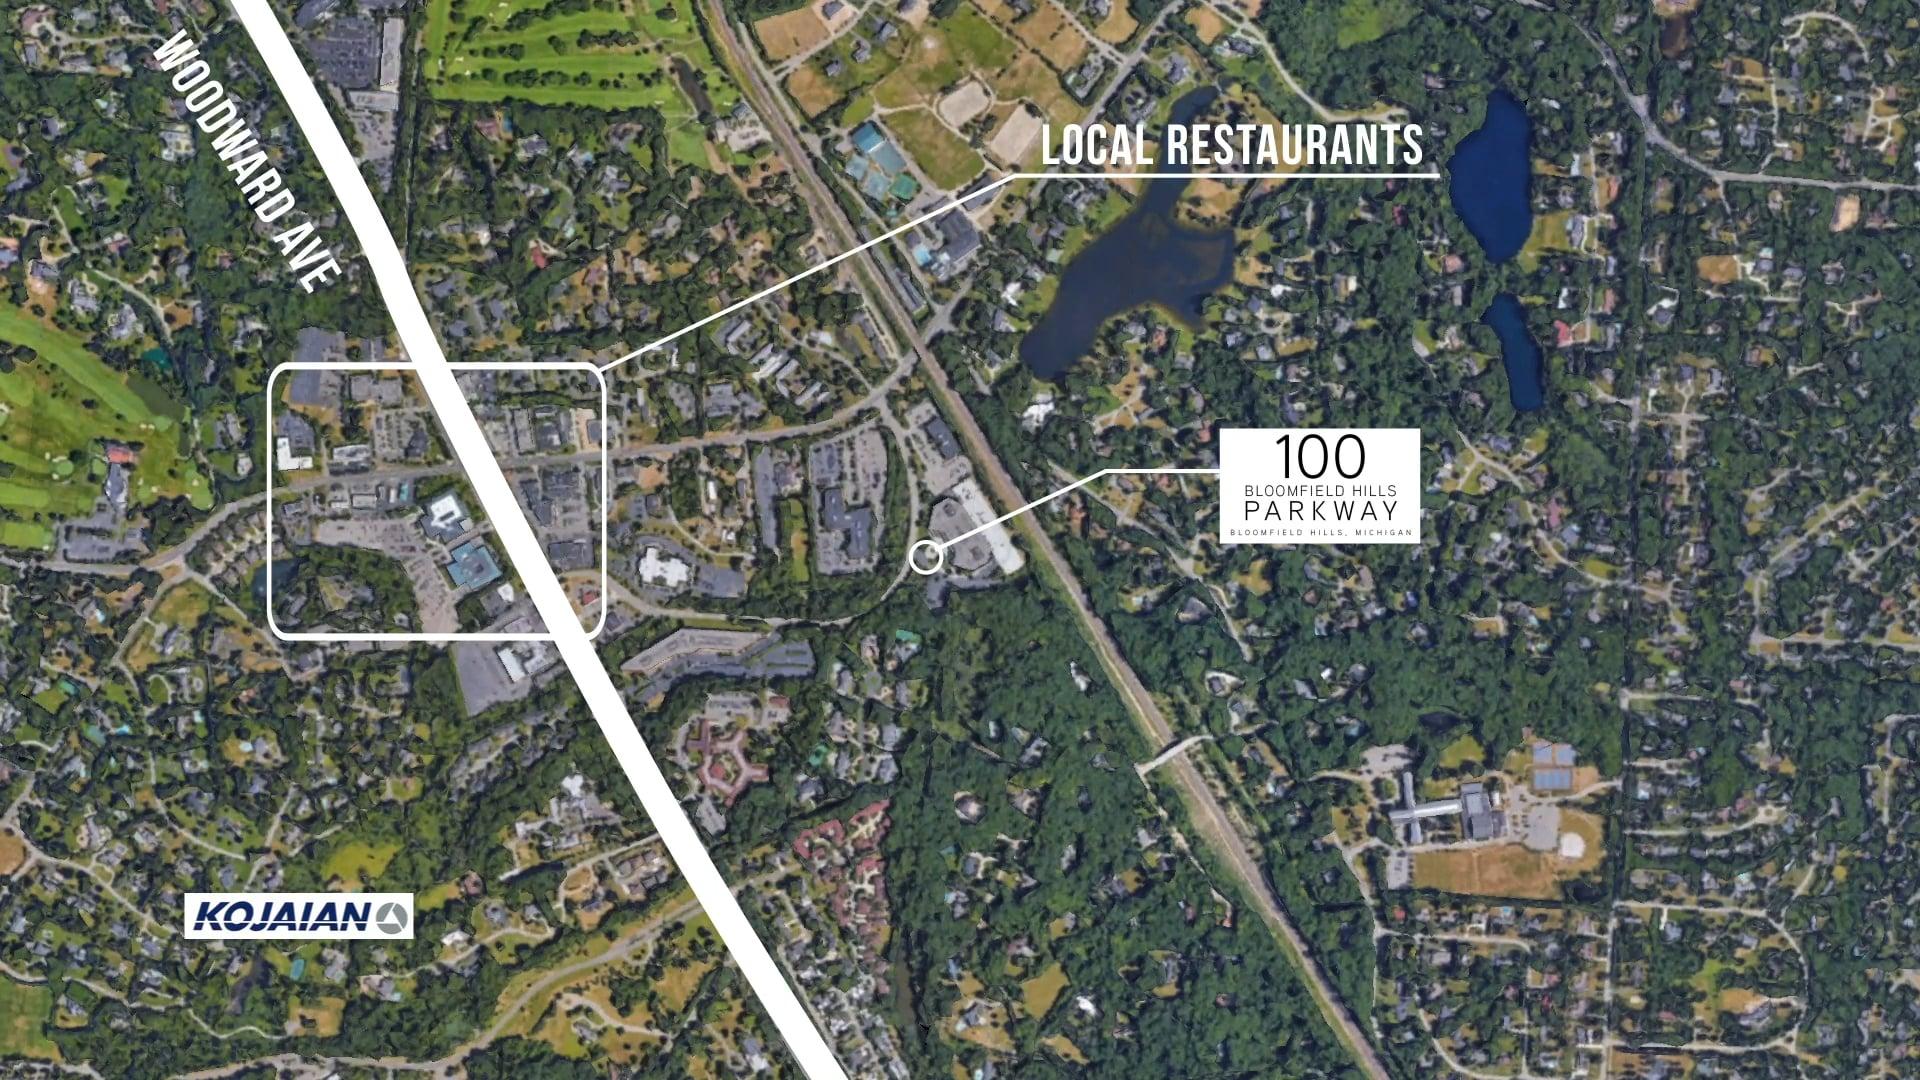 100 Bloomfield Hills Parkway